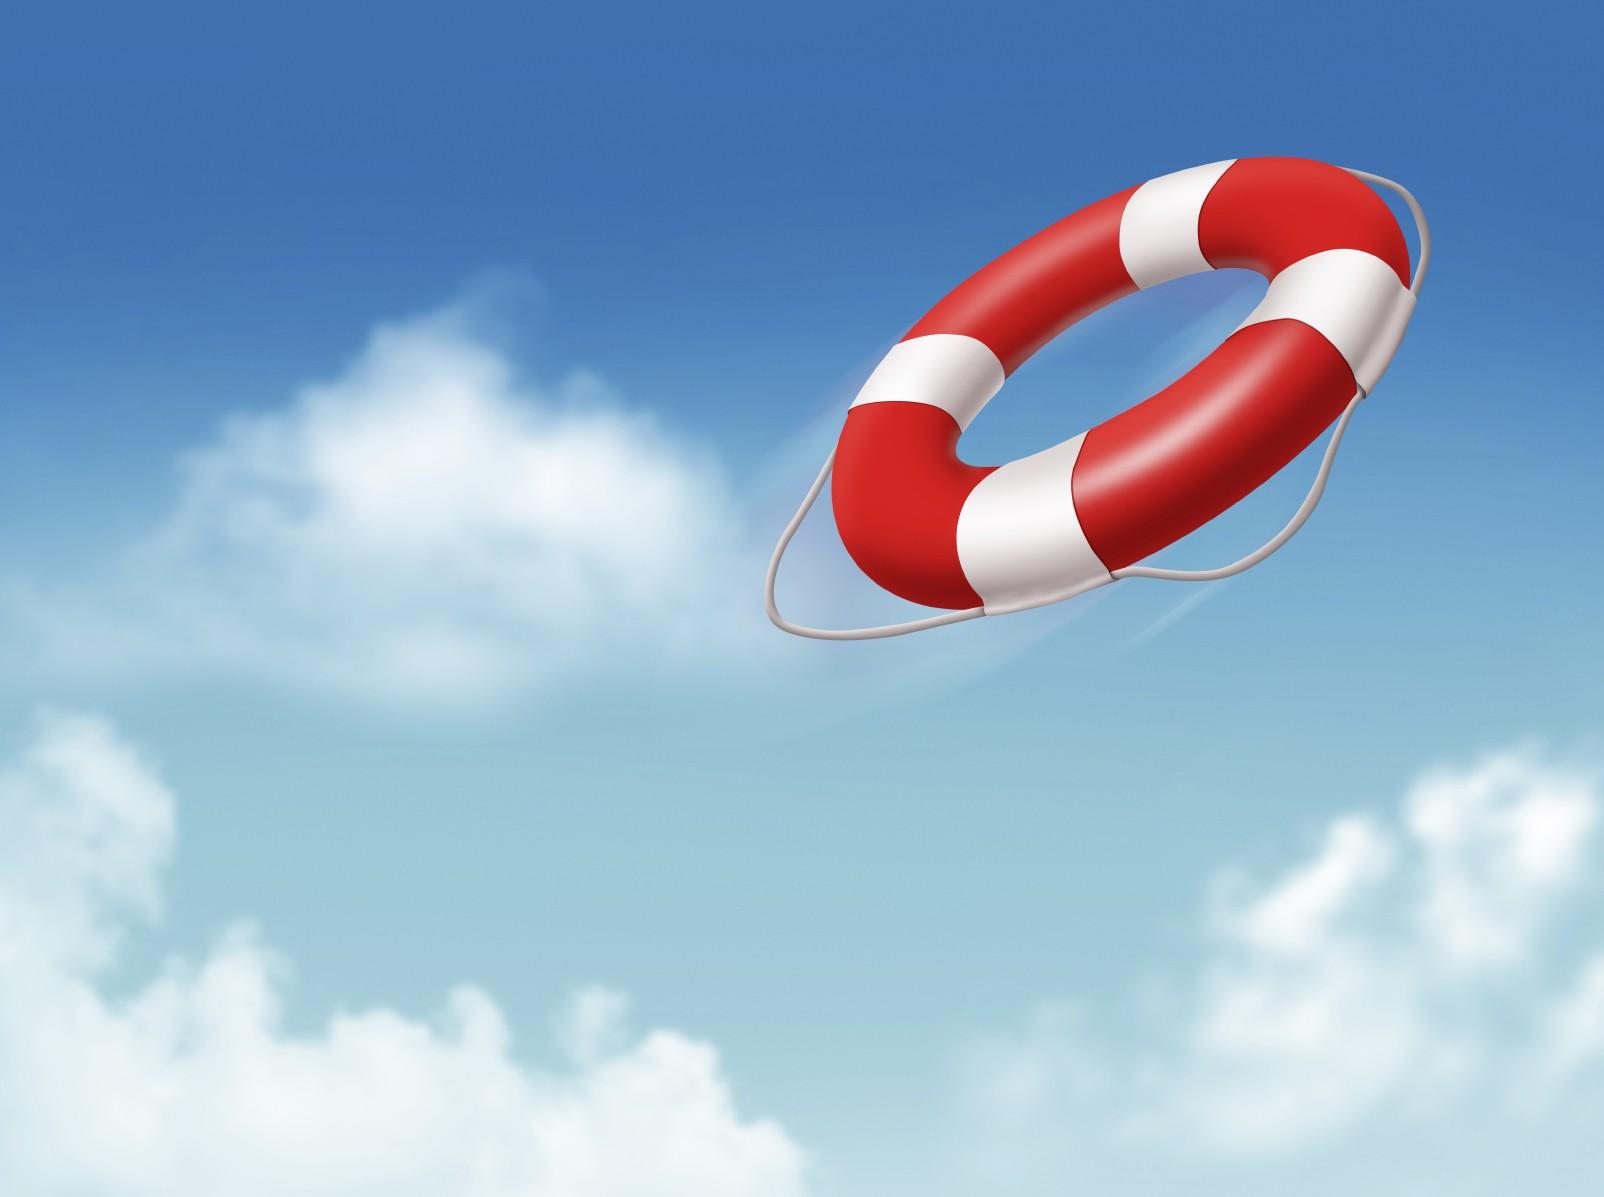 Rettungsring_iStock_000005144538Medium